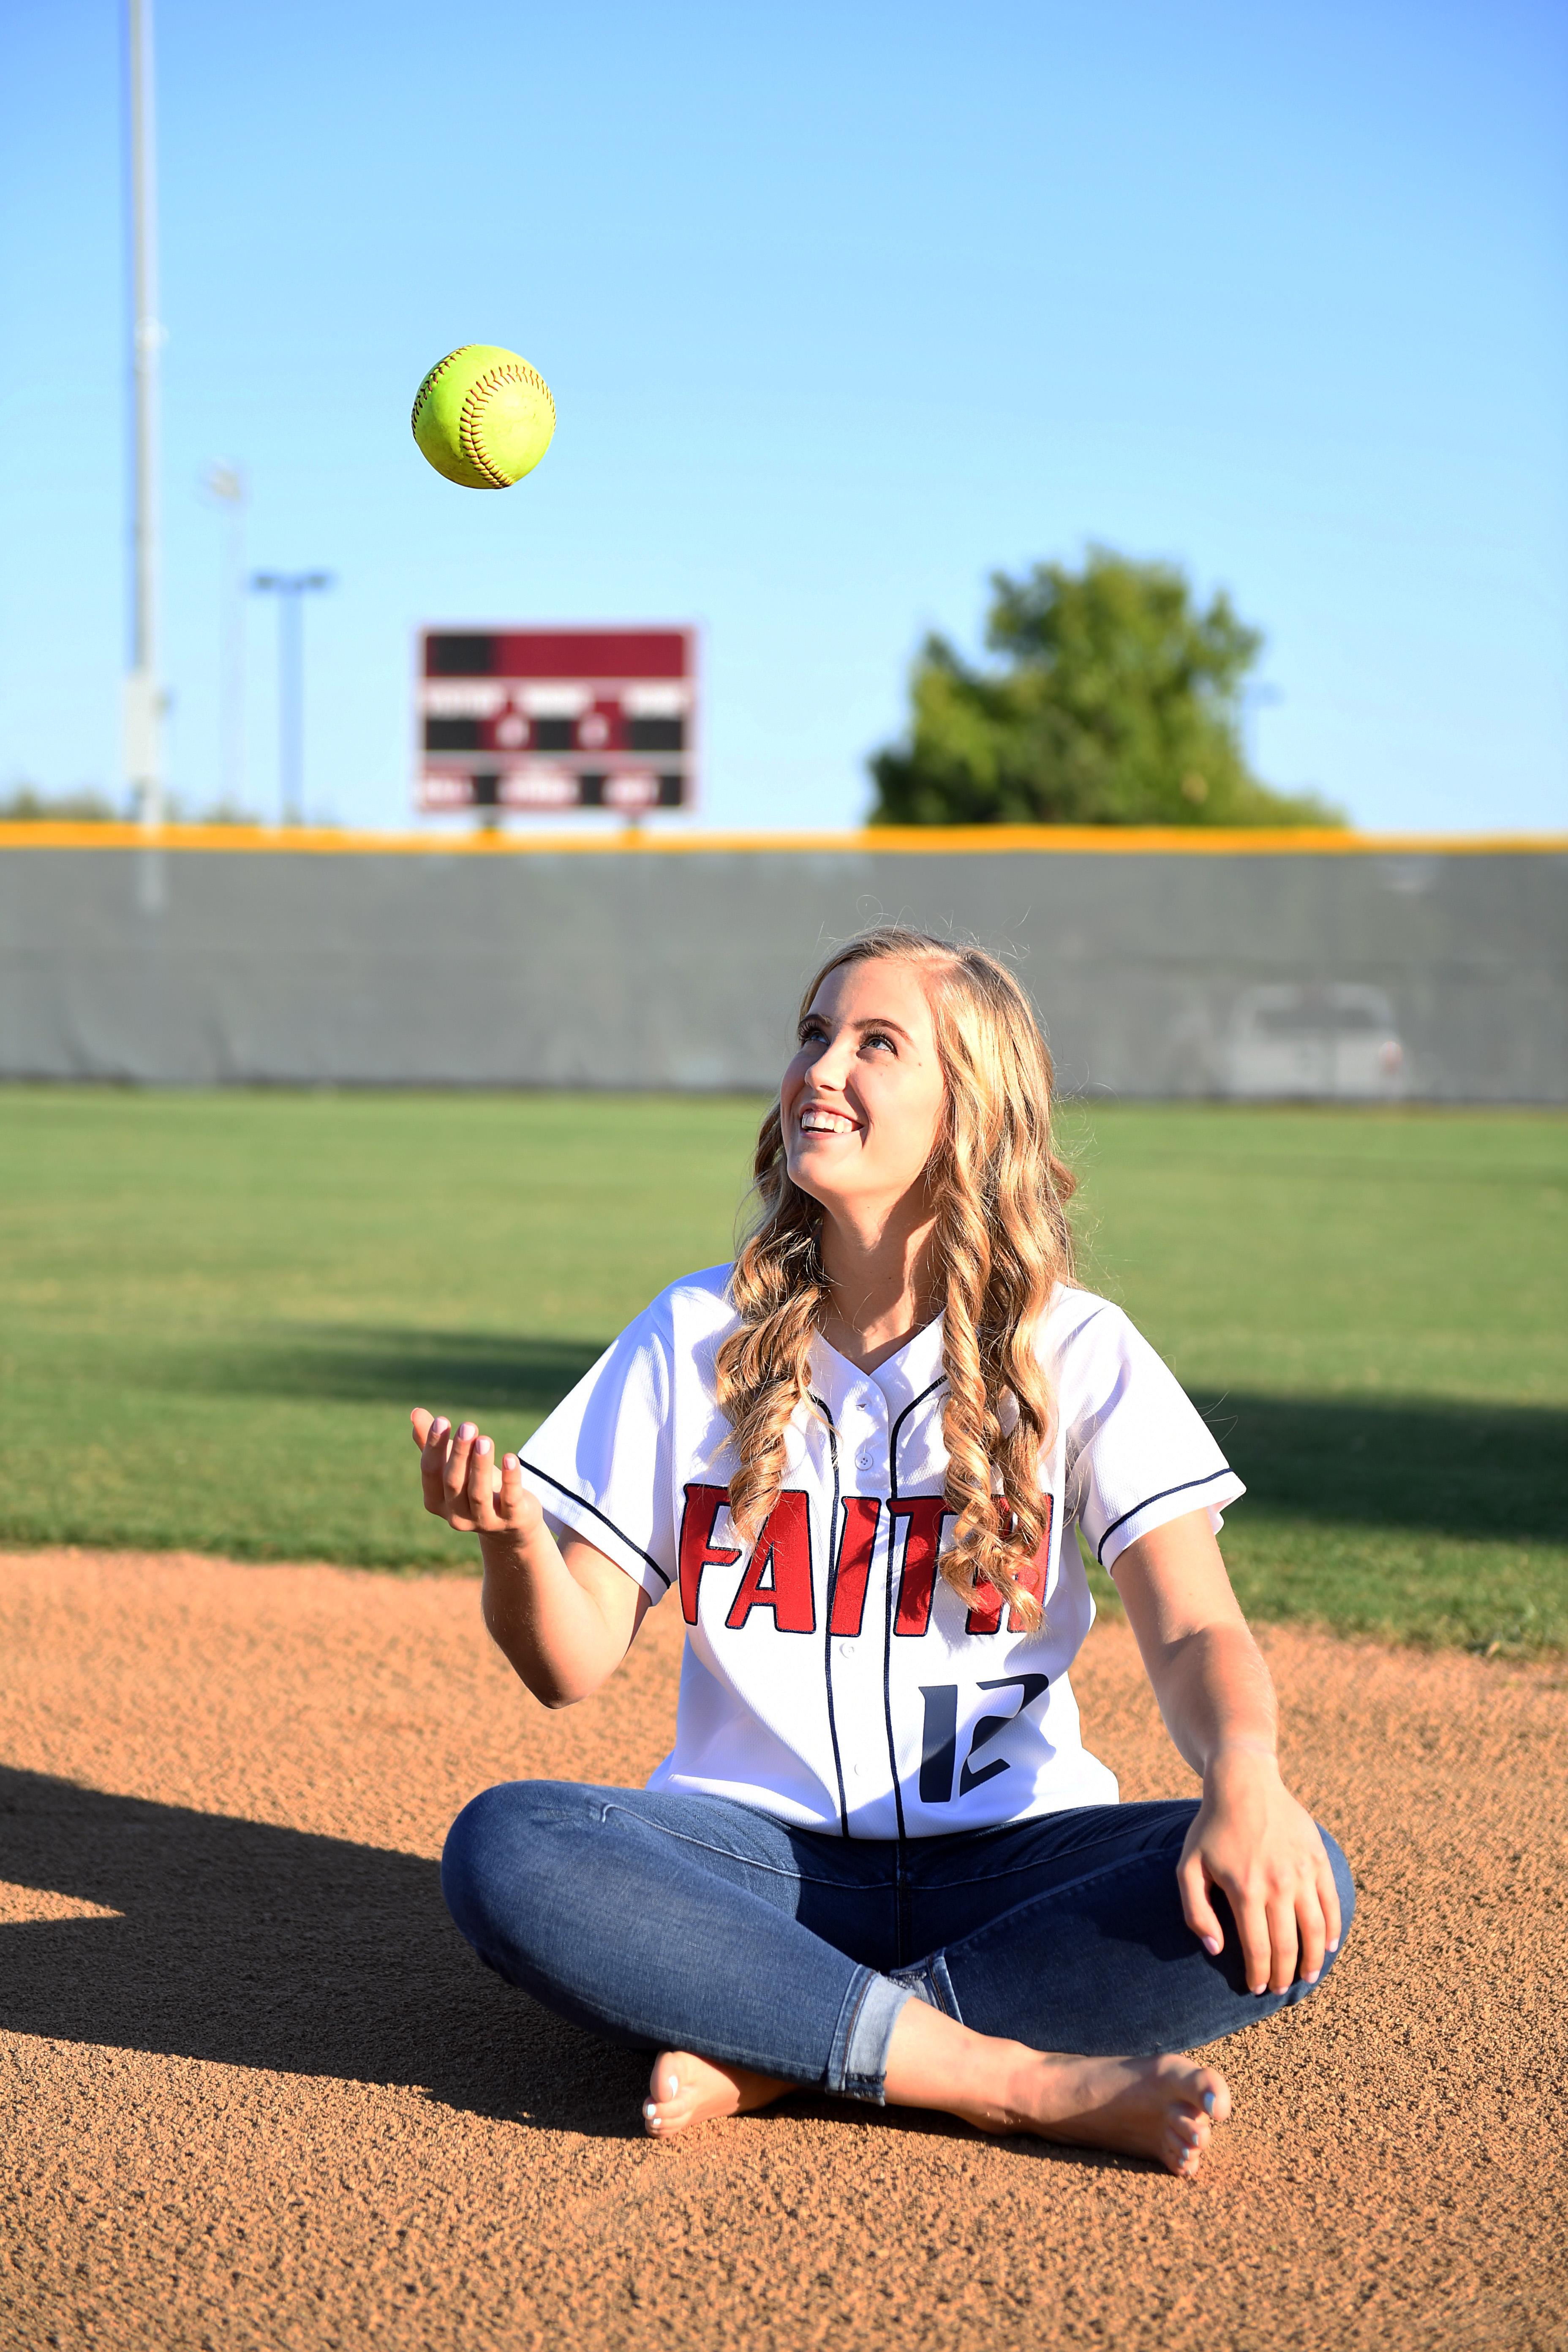 Sports Senior Pictures